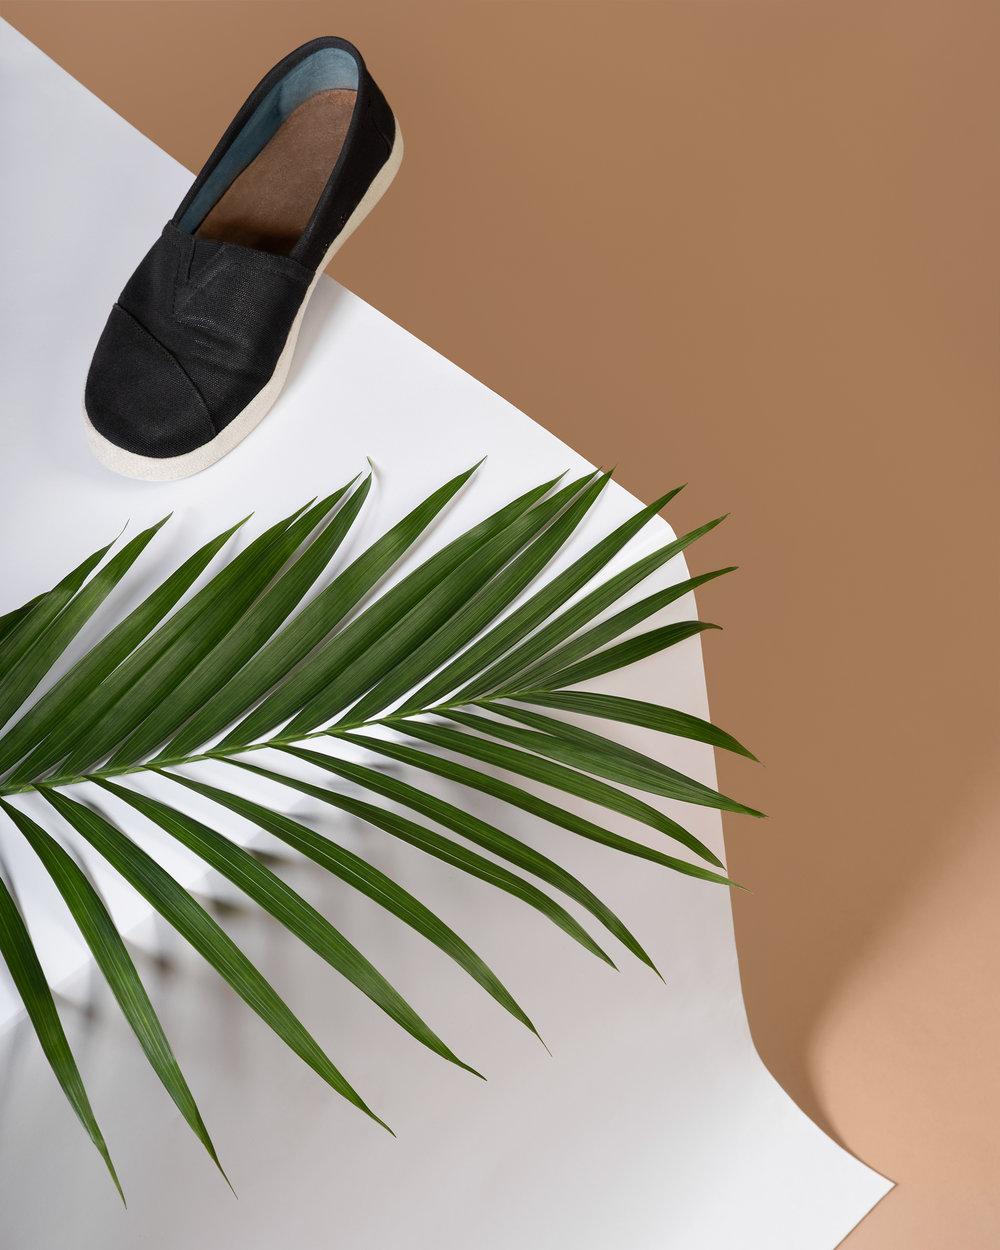 Brooke-Groves-Calgary-Photographer-Product-Palm-Shoe.jpg